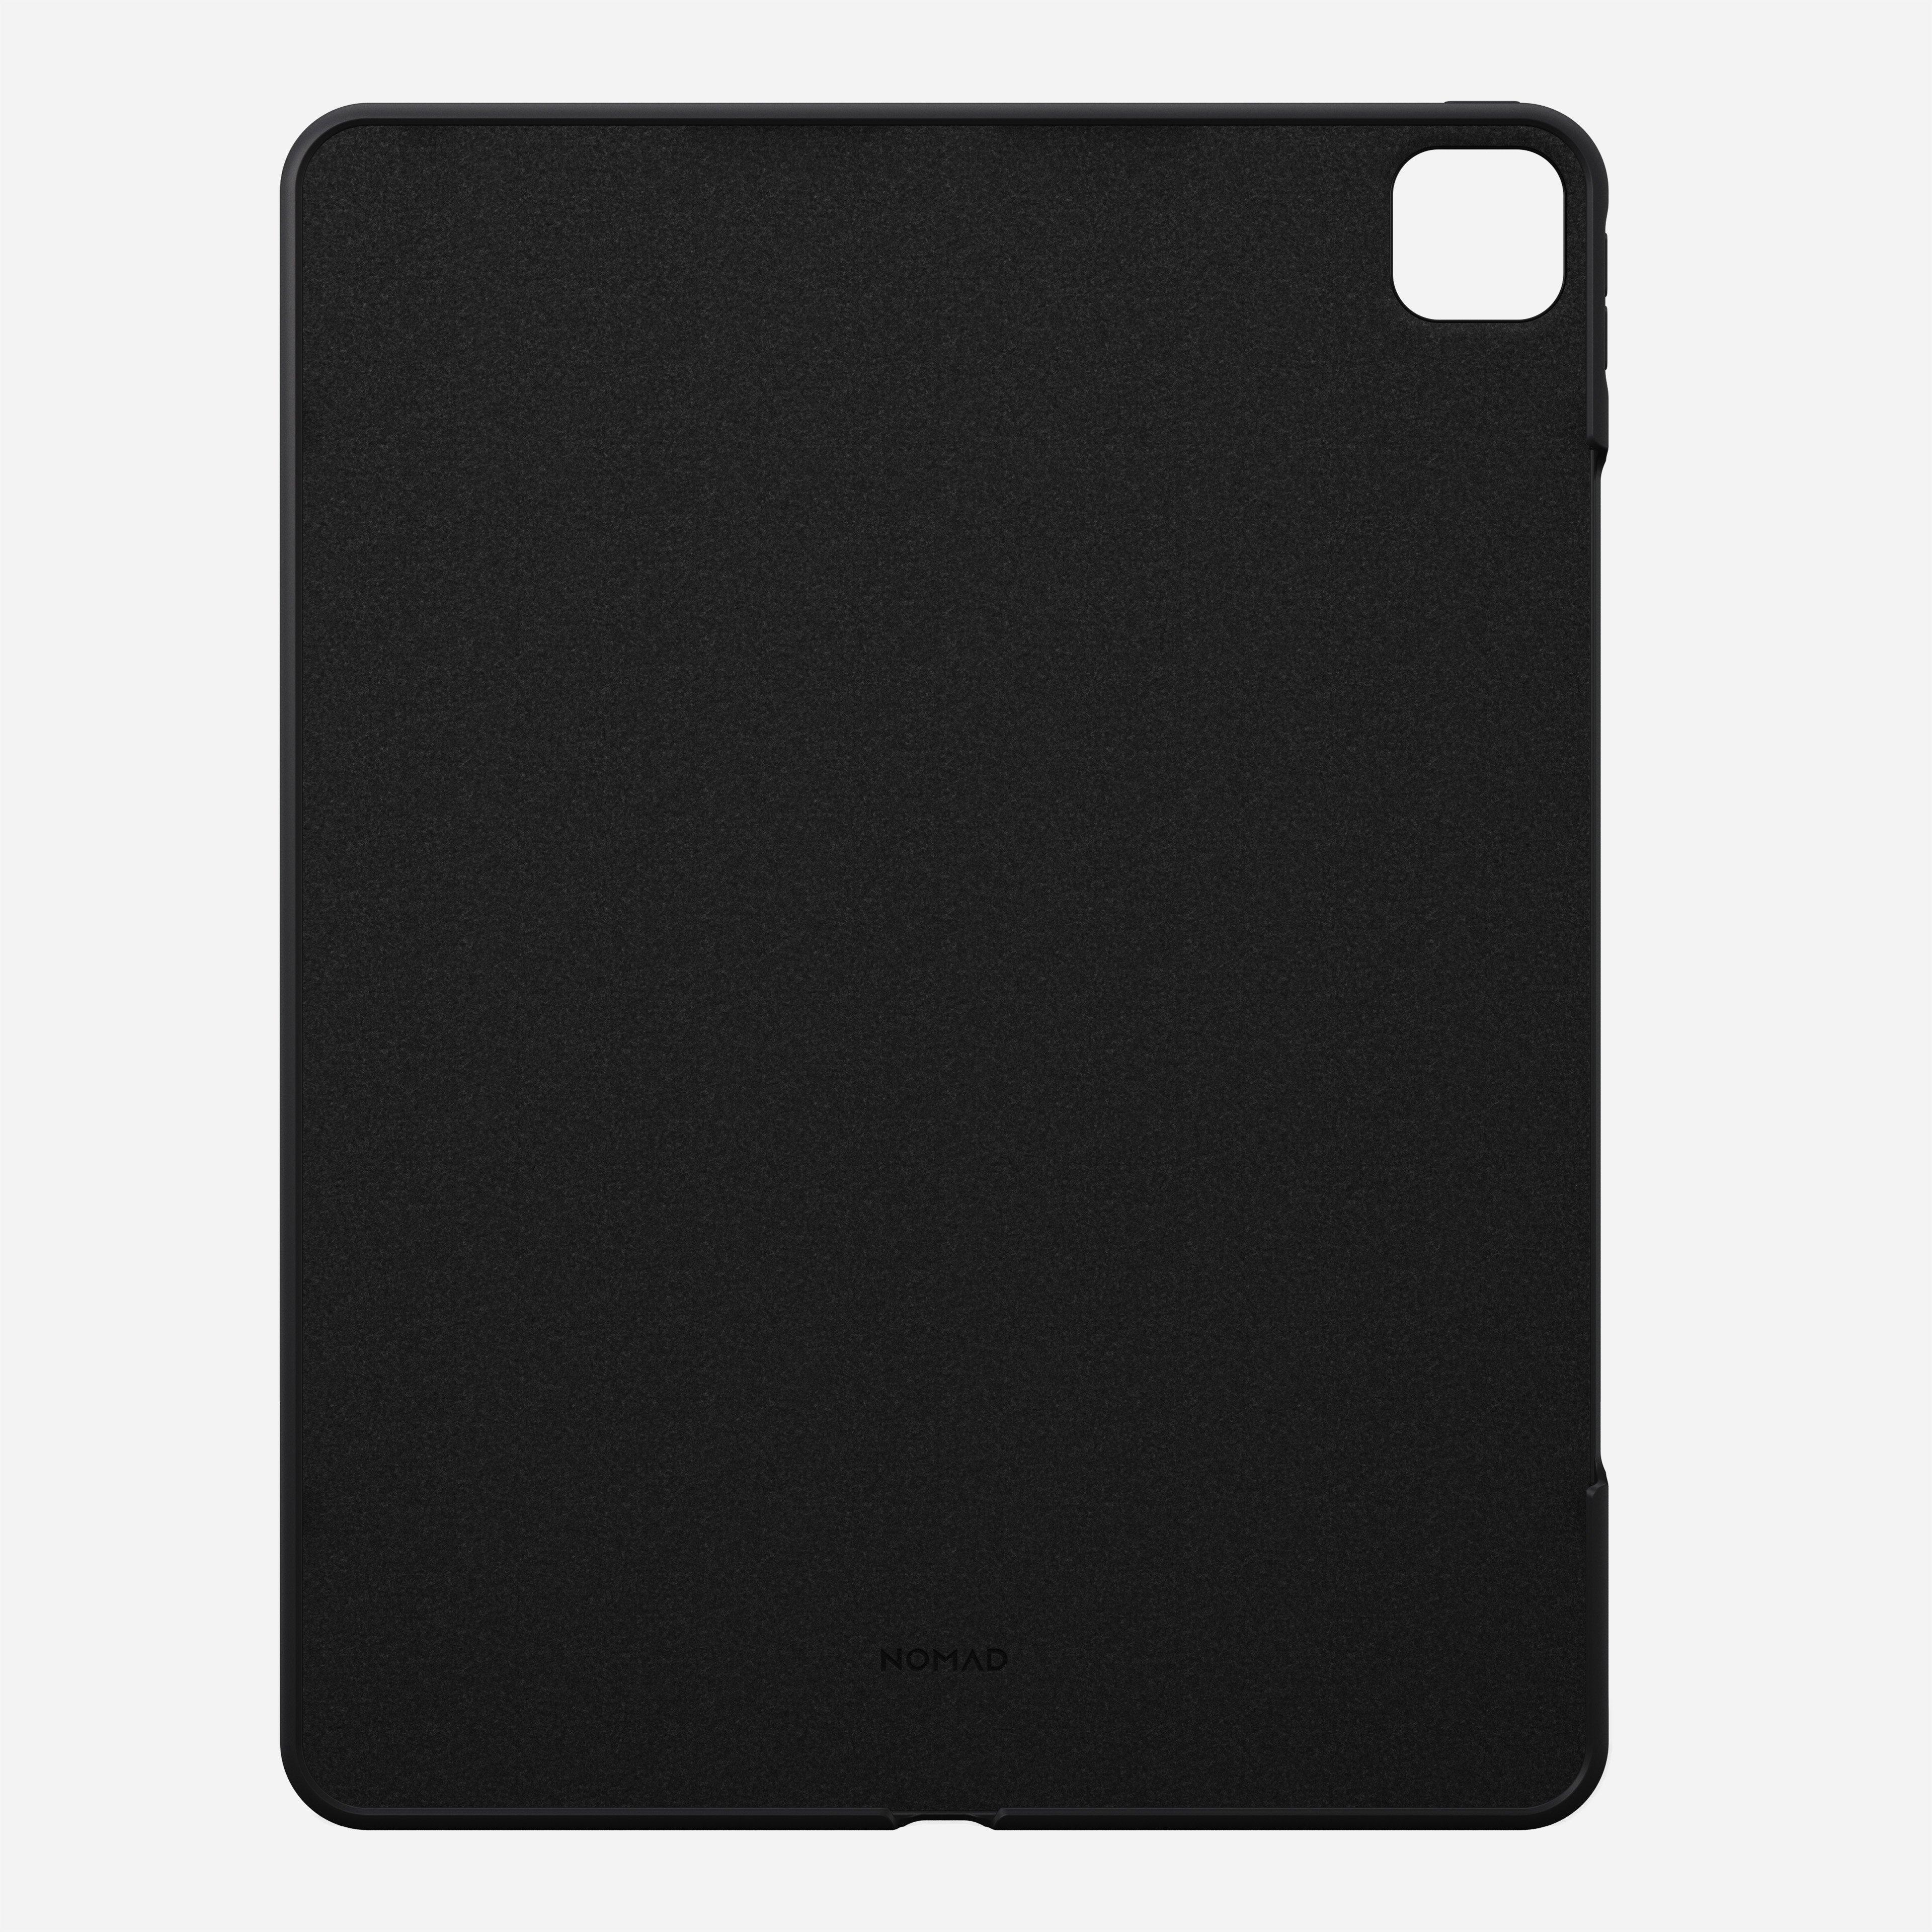 Rugged case pu ipad pro 12 9 inch 4th generation